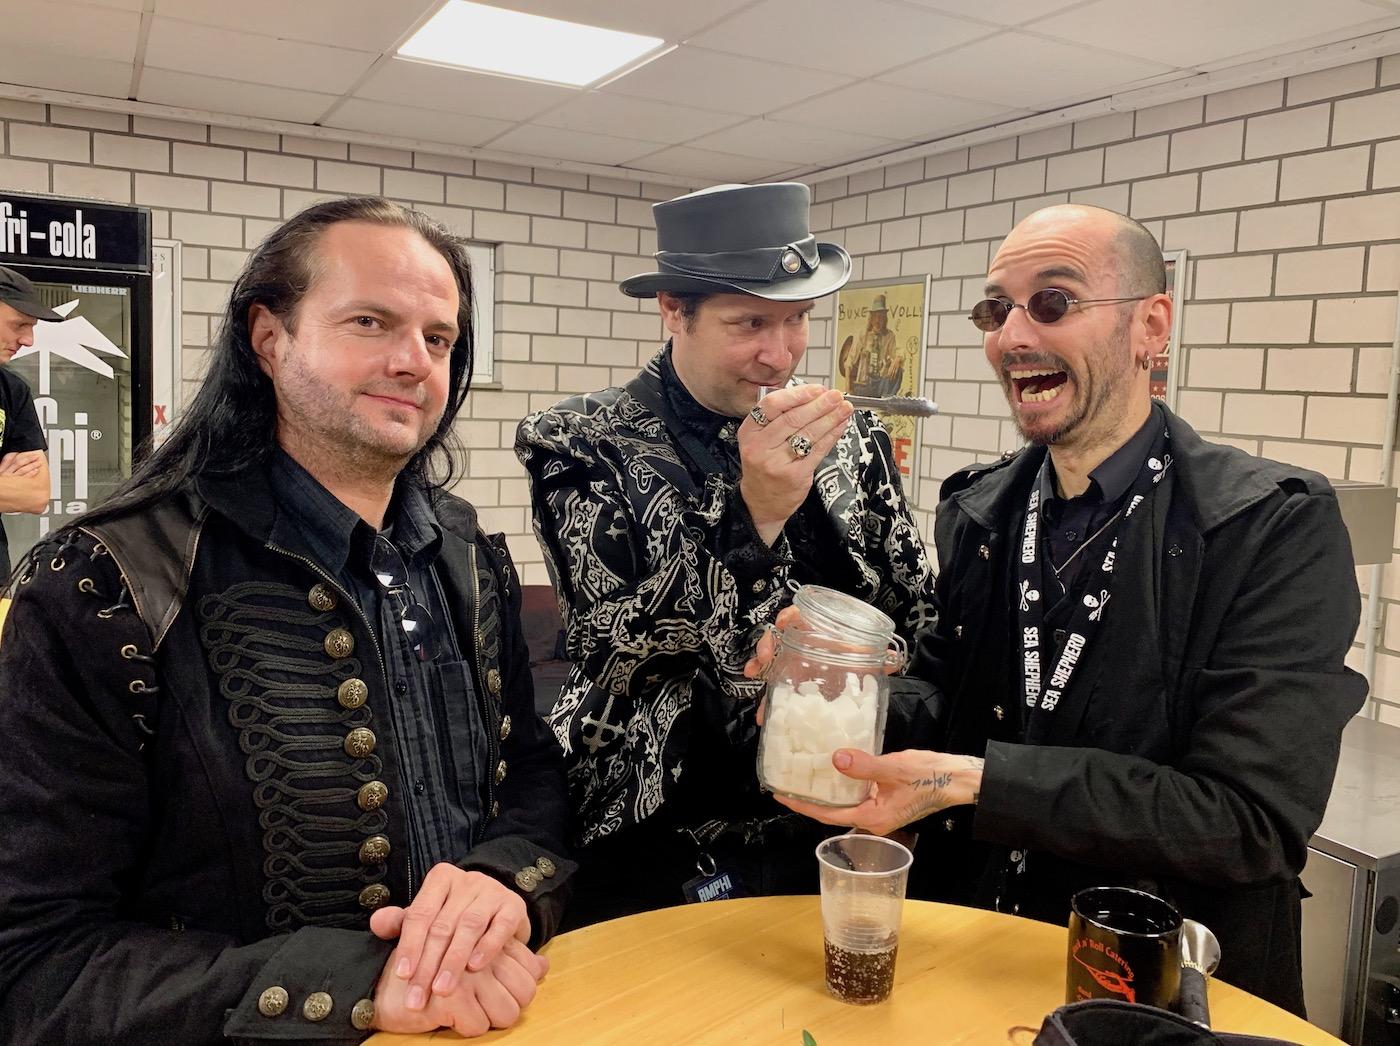 mark_benecke_amphi_festival_koeln_2019 - 120.jpg